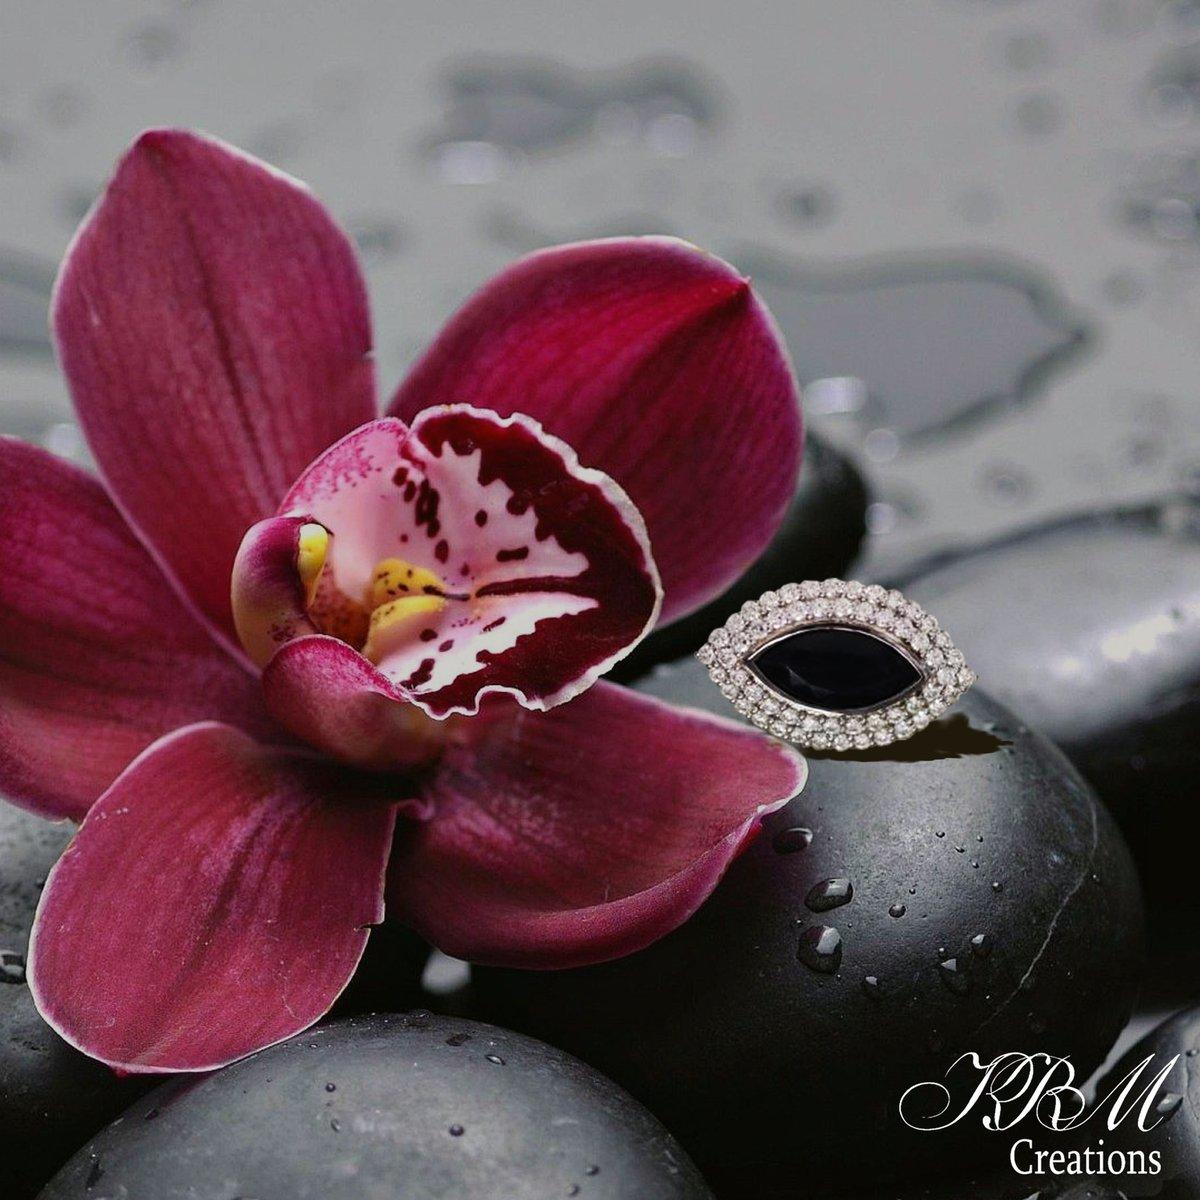 #happy #valentinemonth #feb #blackstone #highjewelry #whitetopaz #blackspinel #spinel #ring #silver #sterlinsilver